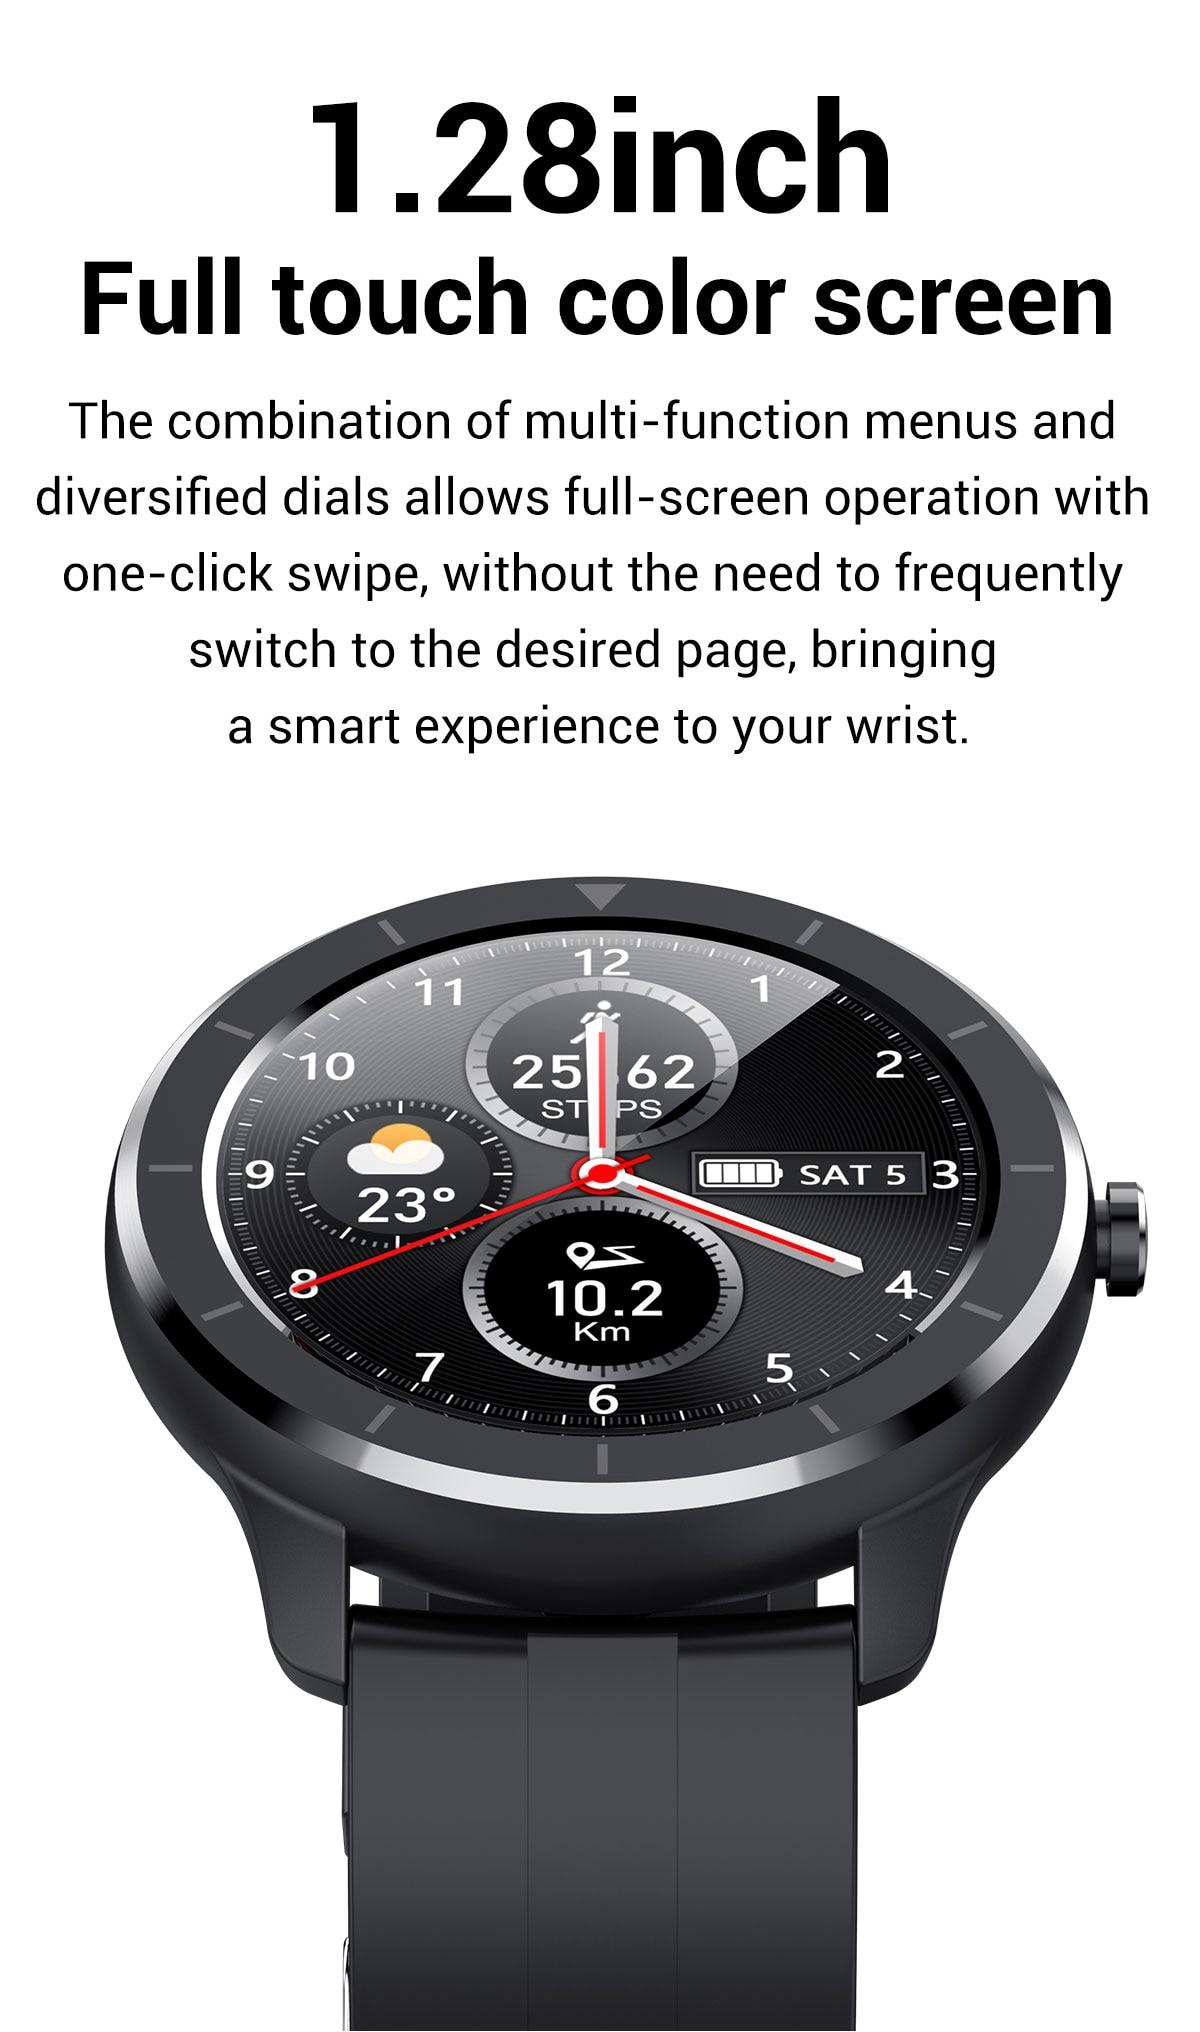 Hfb3cb640c82b407db7778238d5c4d9d2I LEMFO Full Touch Screen Smart Watch Waterproof Smartwatch Men